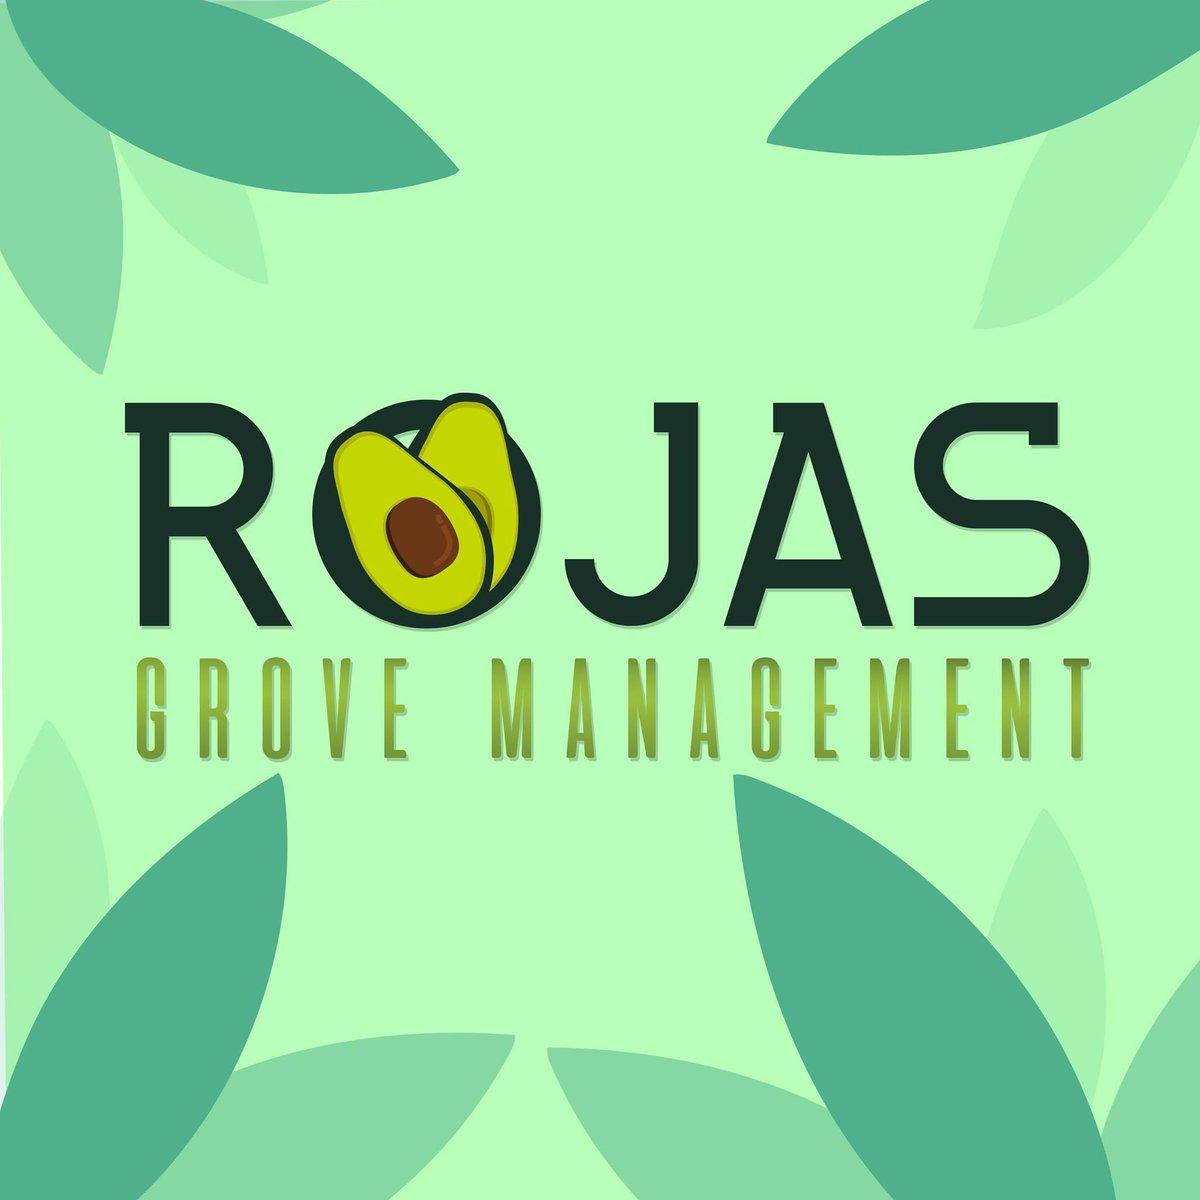 Place your #lemon, #avocado and #orange orders! Ship #nationwide 🍋🍊🥑 #RojasGroveManagement #FamilyHustle